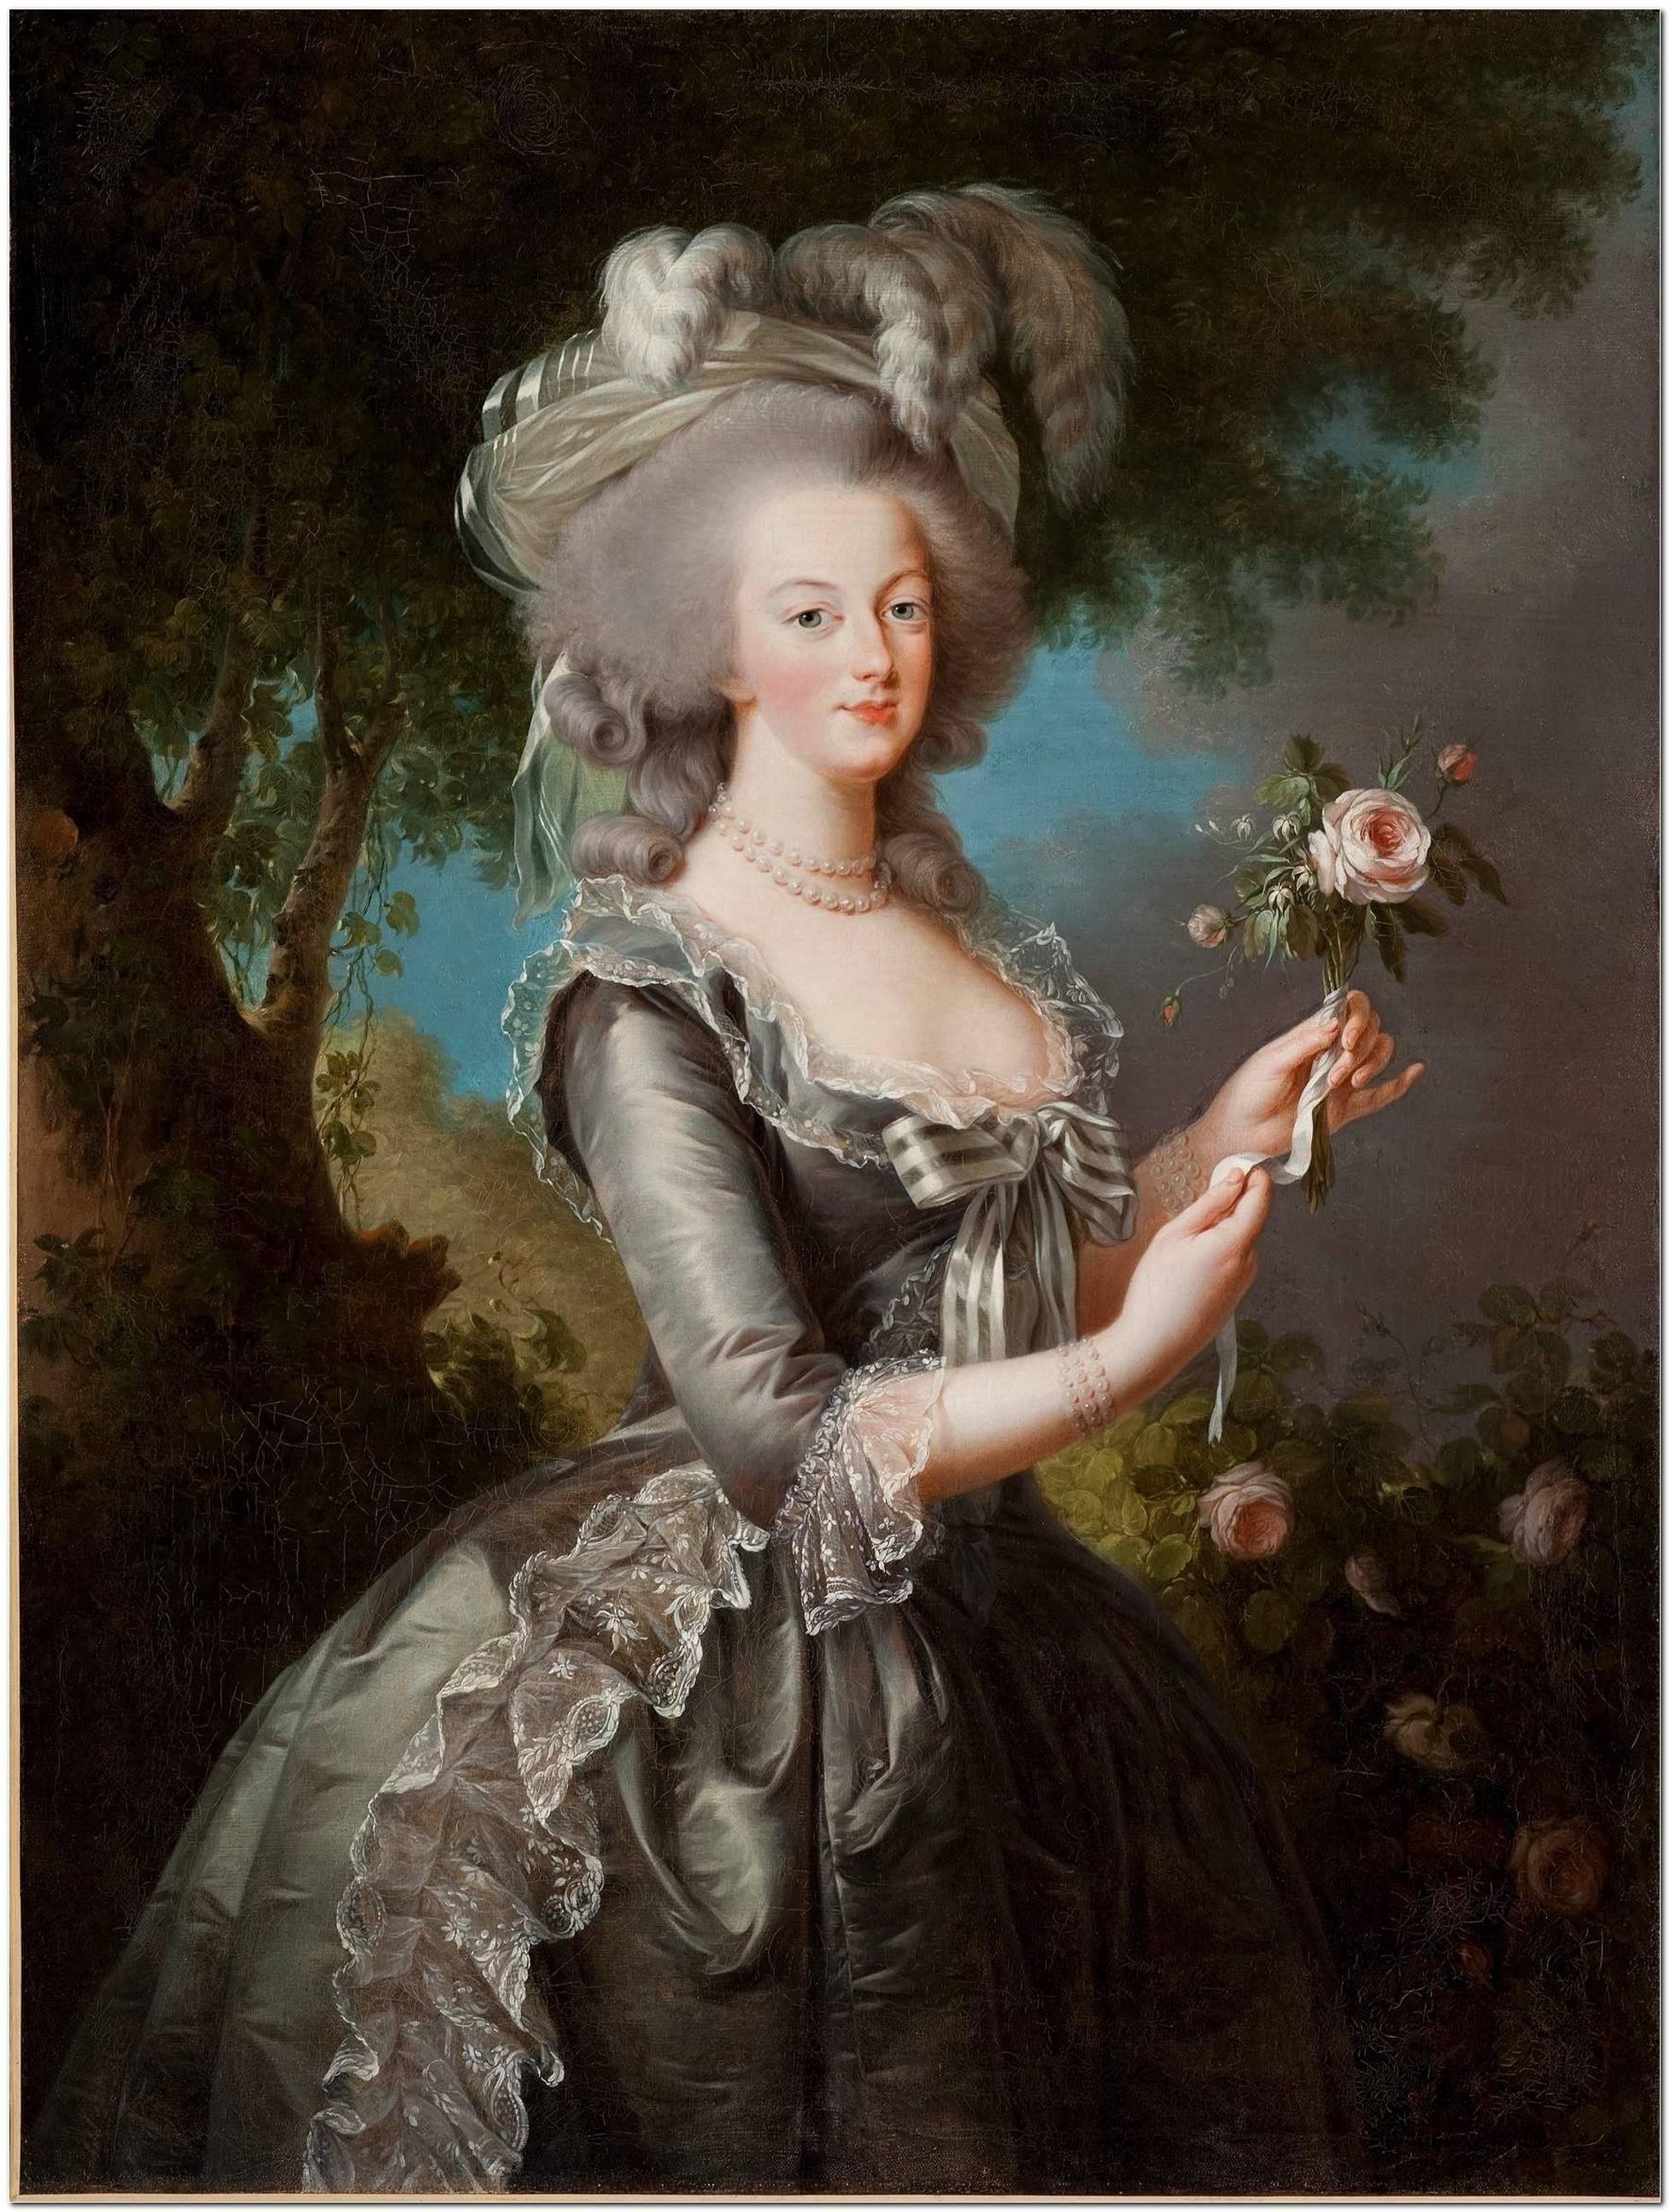 Marie Antoinette Frisur